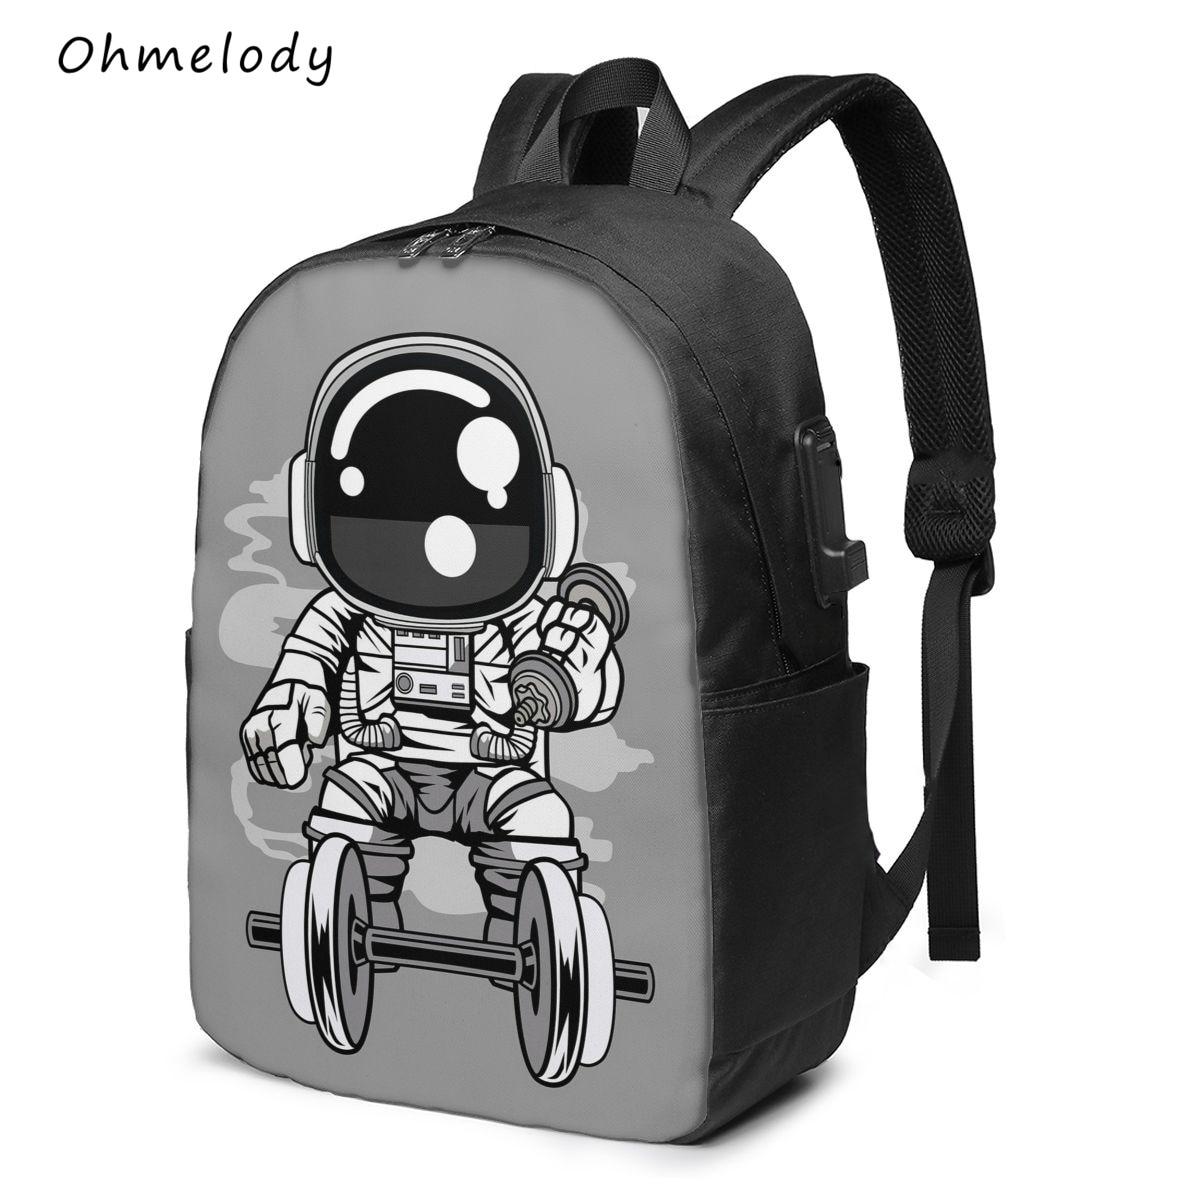 Cartoon Astronaut Multipurpose 17in Laptop Backpack Water Resistant Durable Middle School College Ba